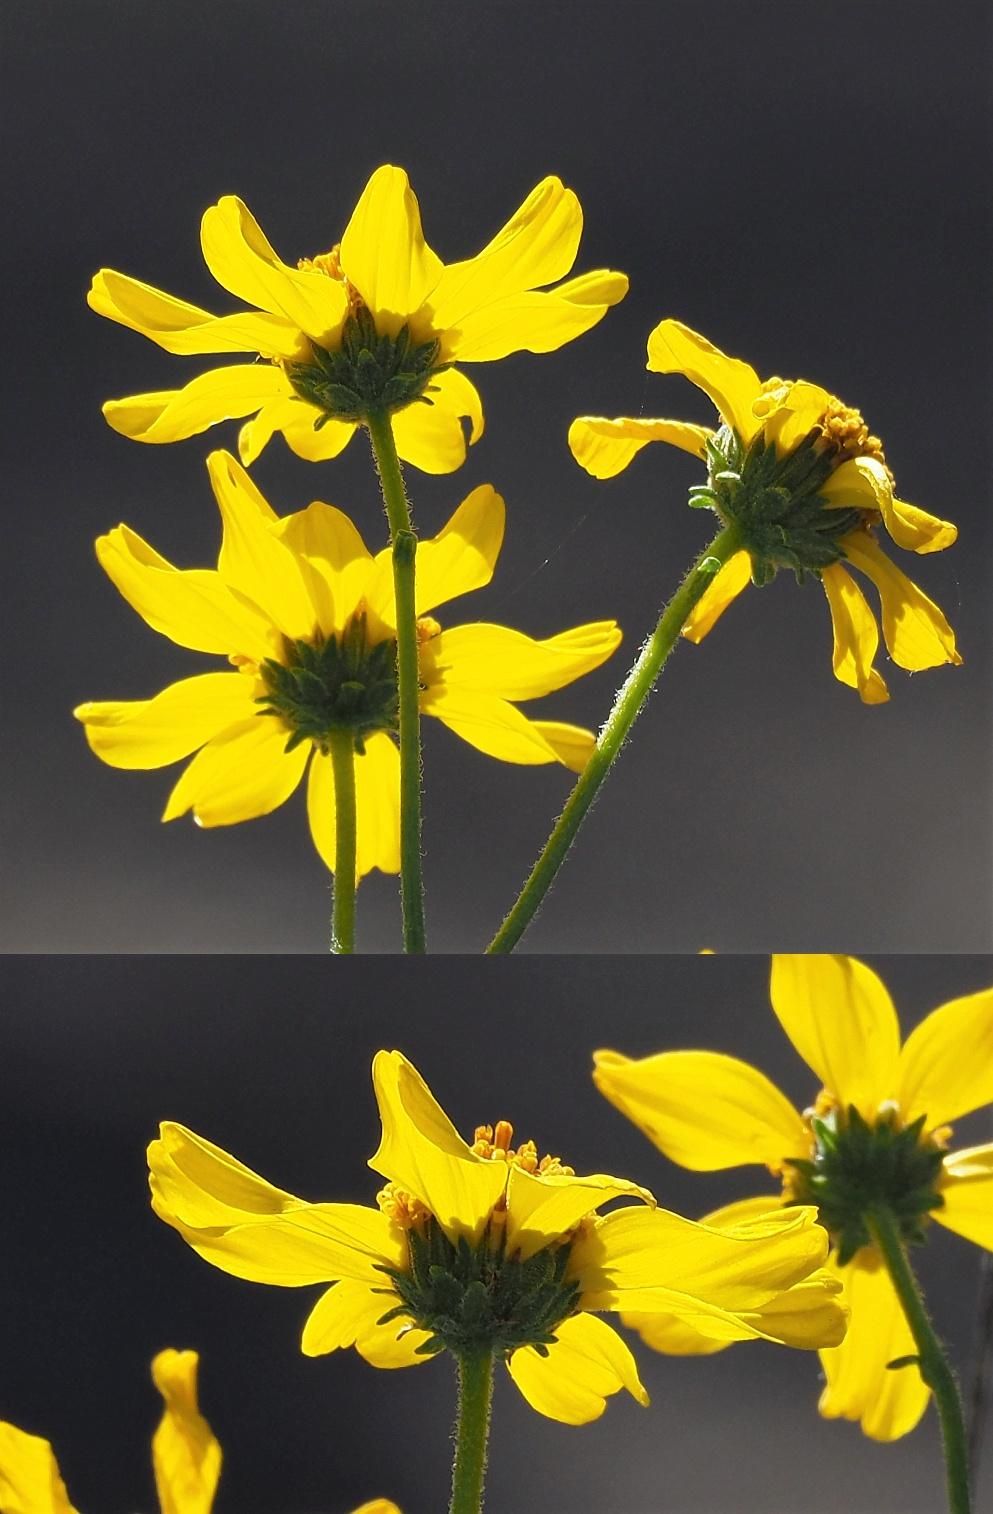 2-photo collage of yellow desert daisies